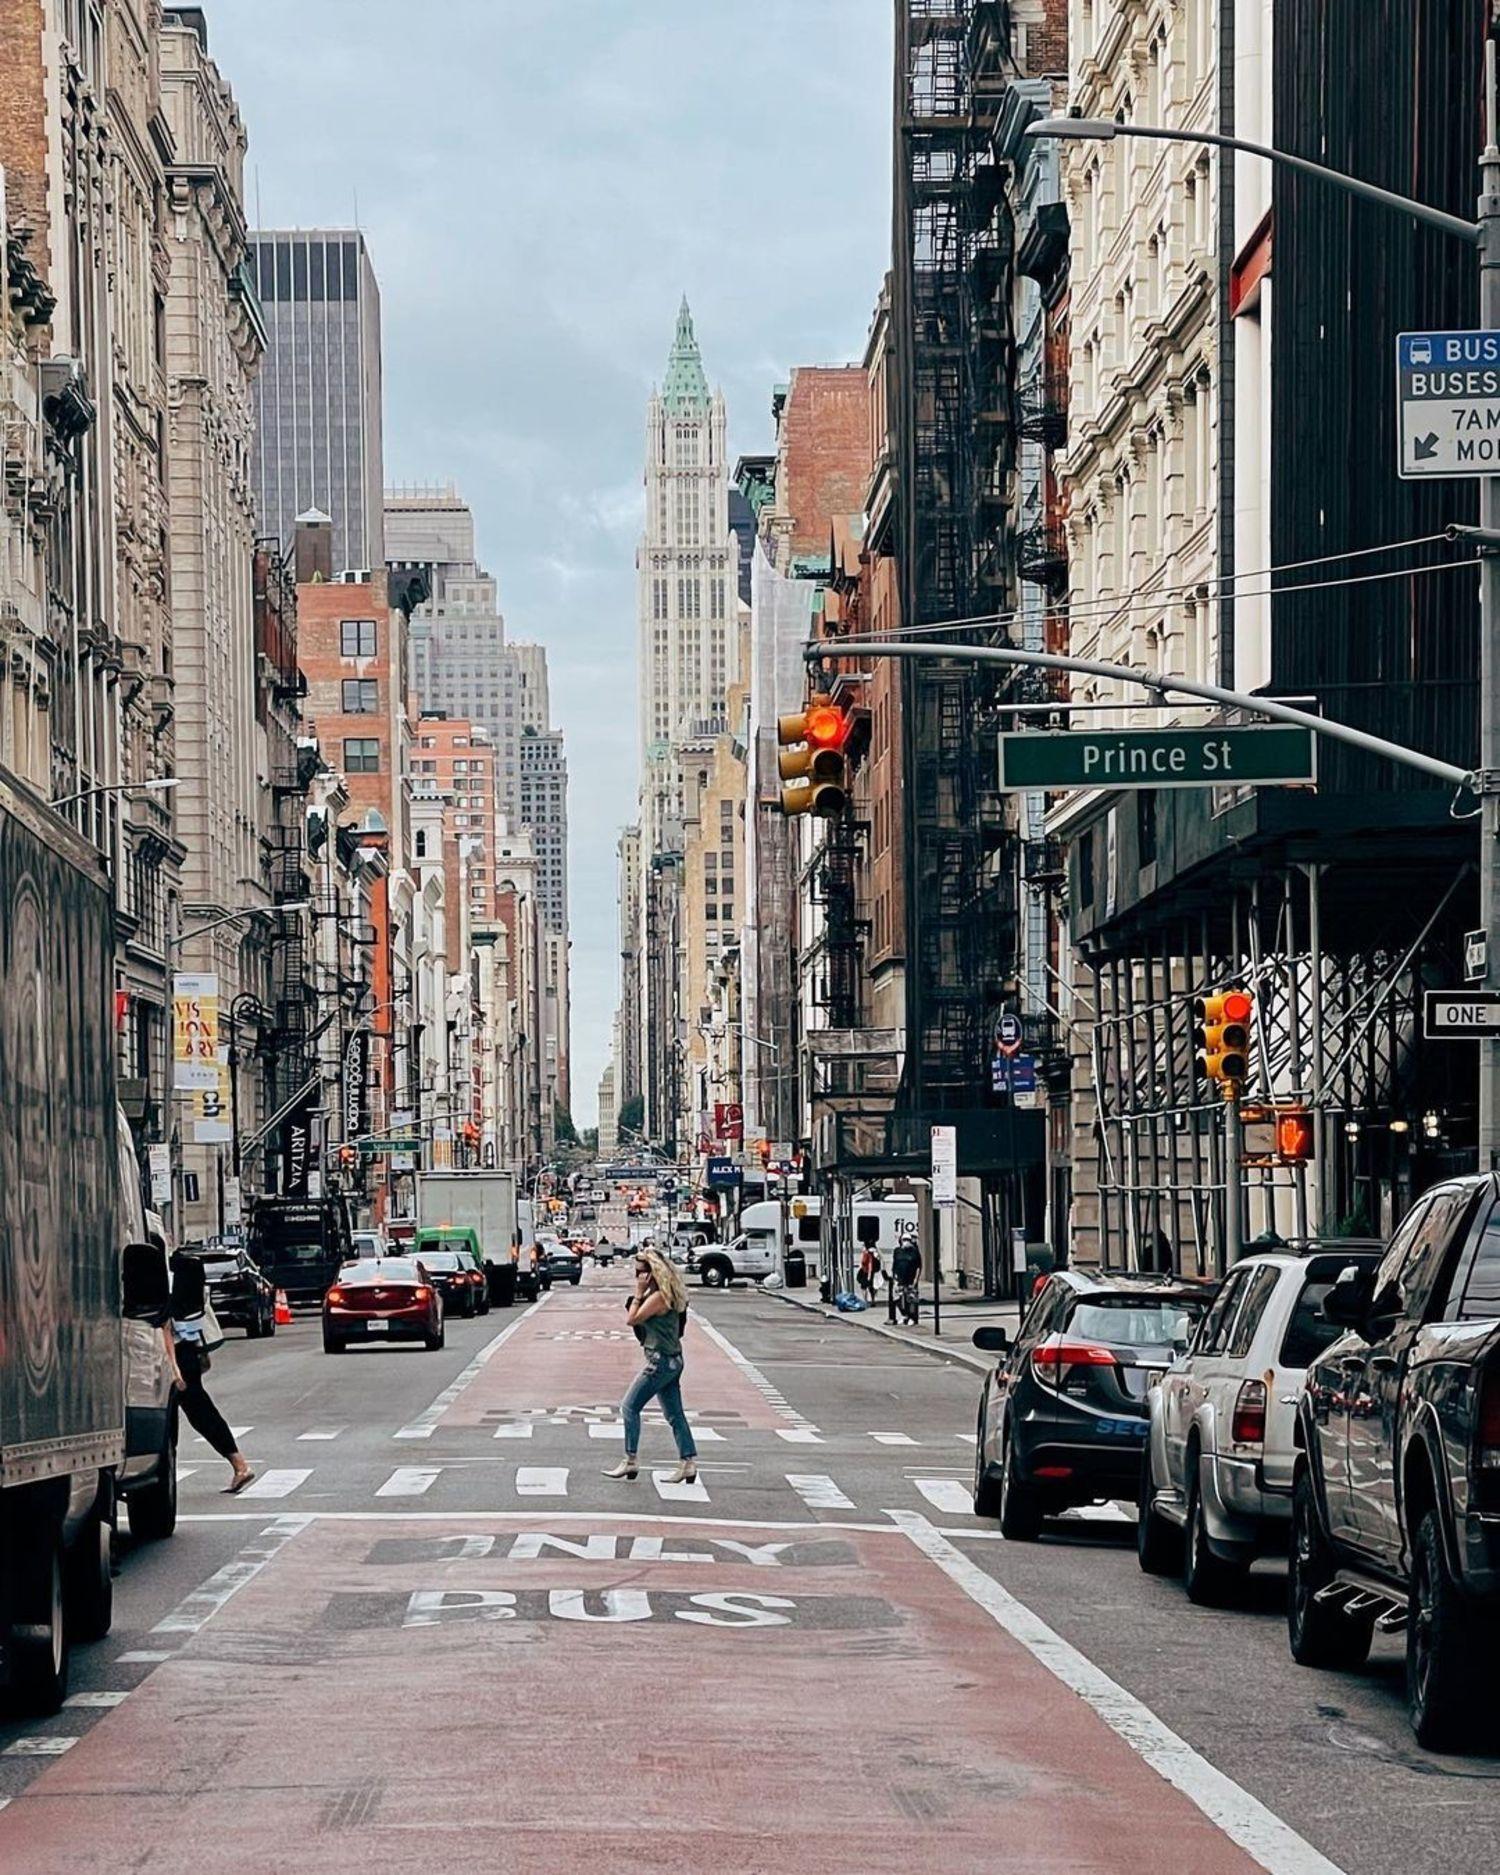 Broadway and Price Street, SoHo, Manhattan